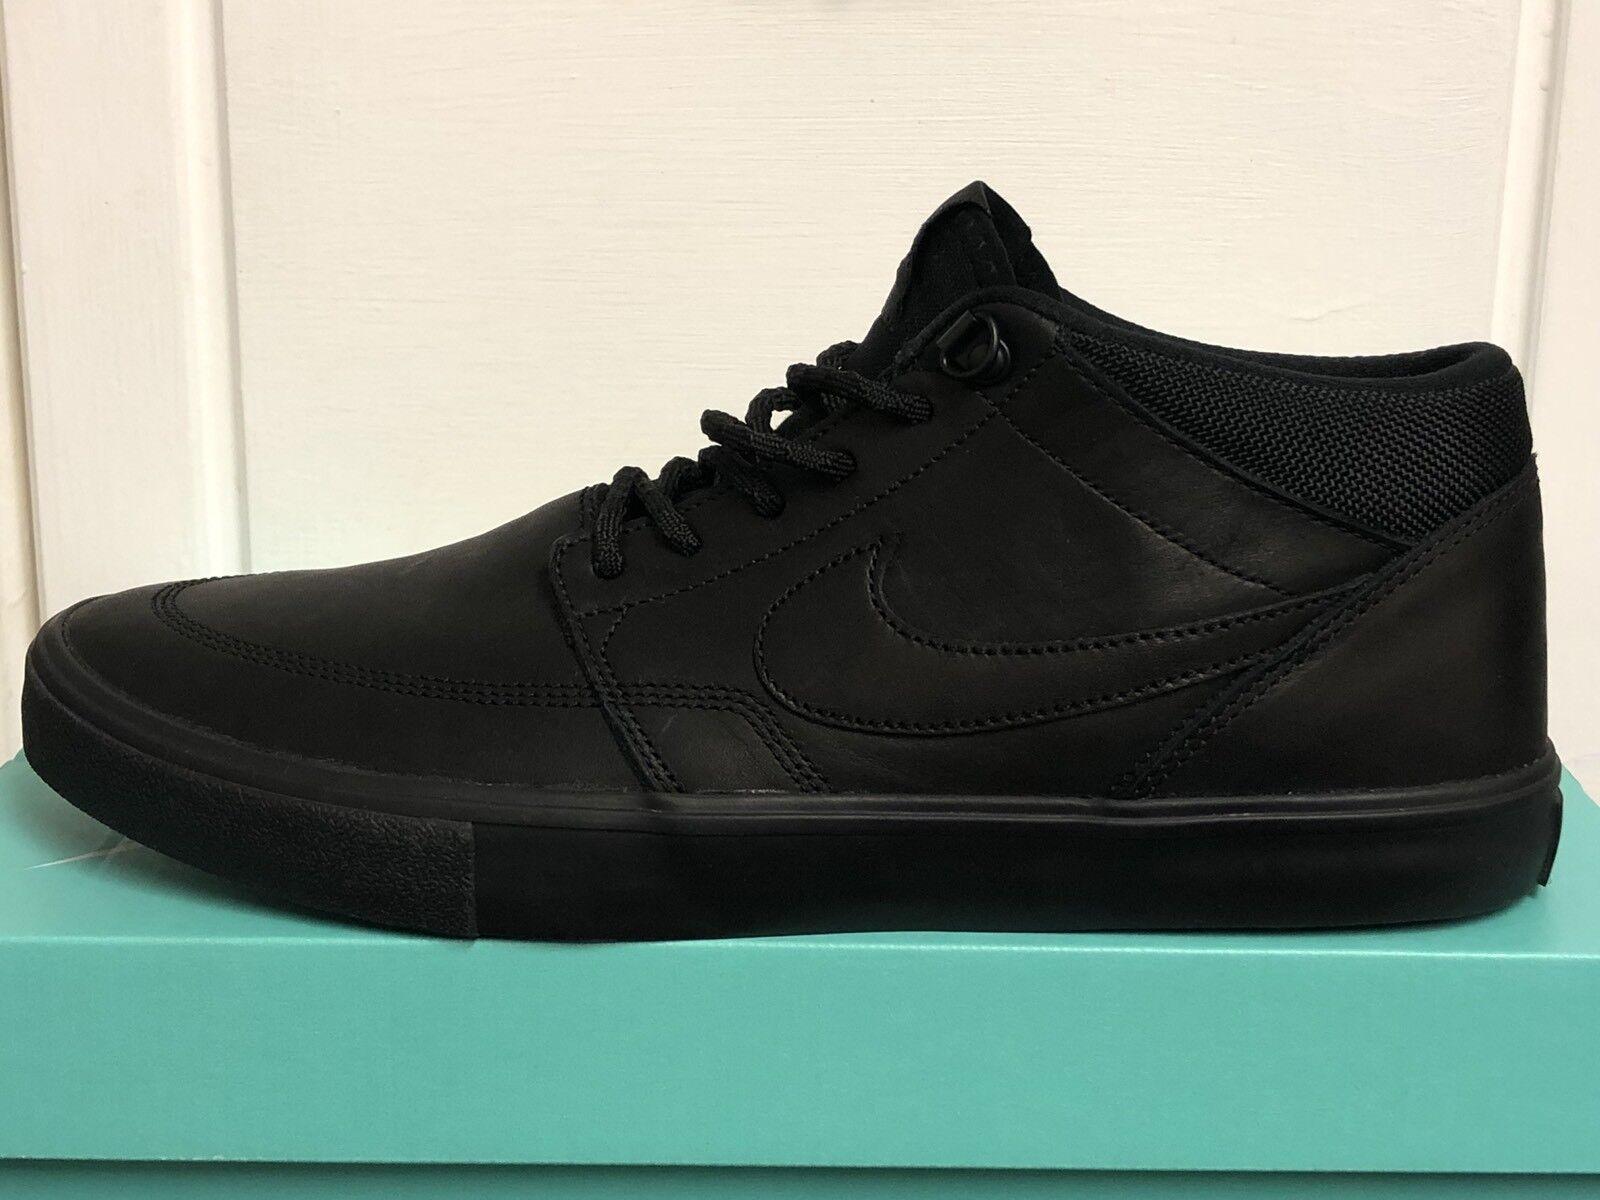 NIKE SB PORTMORE II SOLAR MID Hommes Trainers SNEAKERS Chaussures 6,5 EU40,5 Janoski